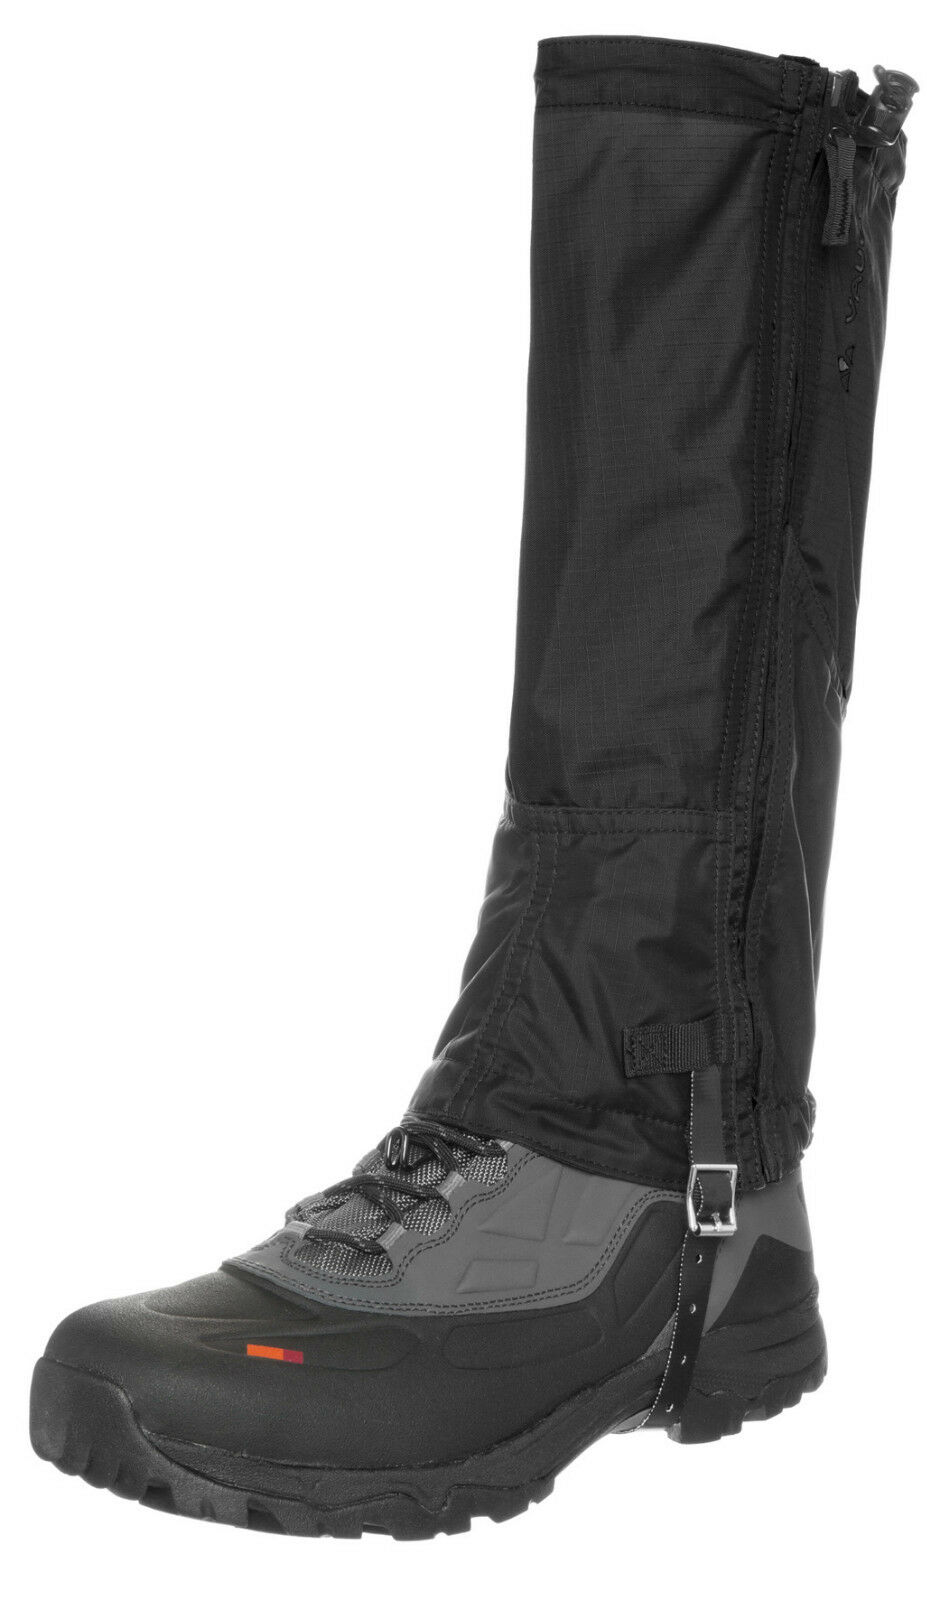 Vaude Gaiter, polainas, abajo  Gaiter II, GR  m, senderismo, trekken zapato de nieve  bienvenido a elegir